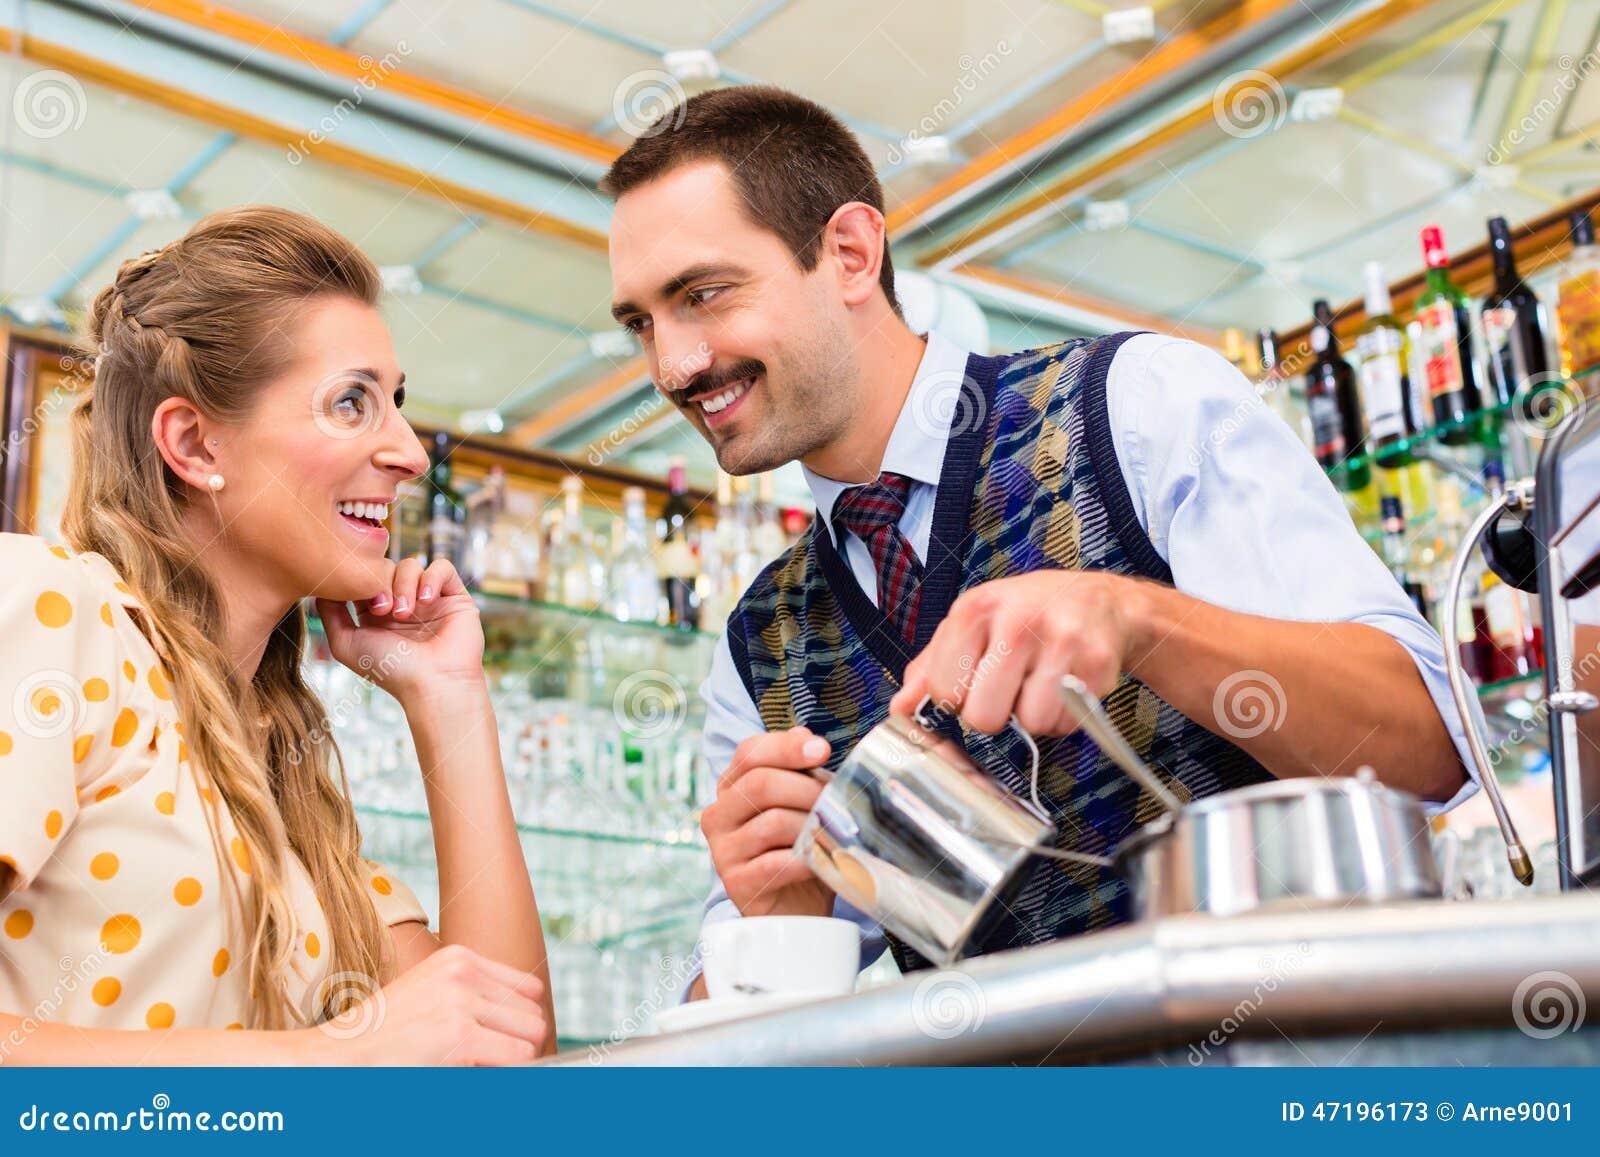 flirt buddies customer service